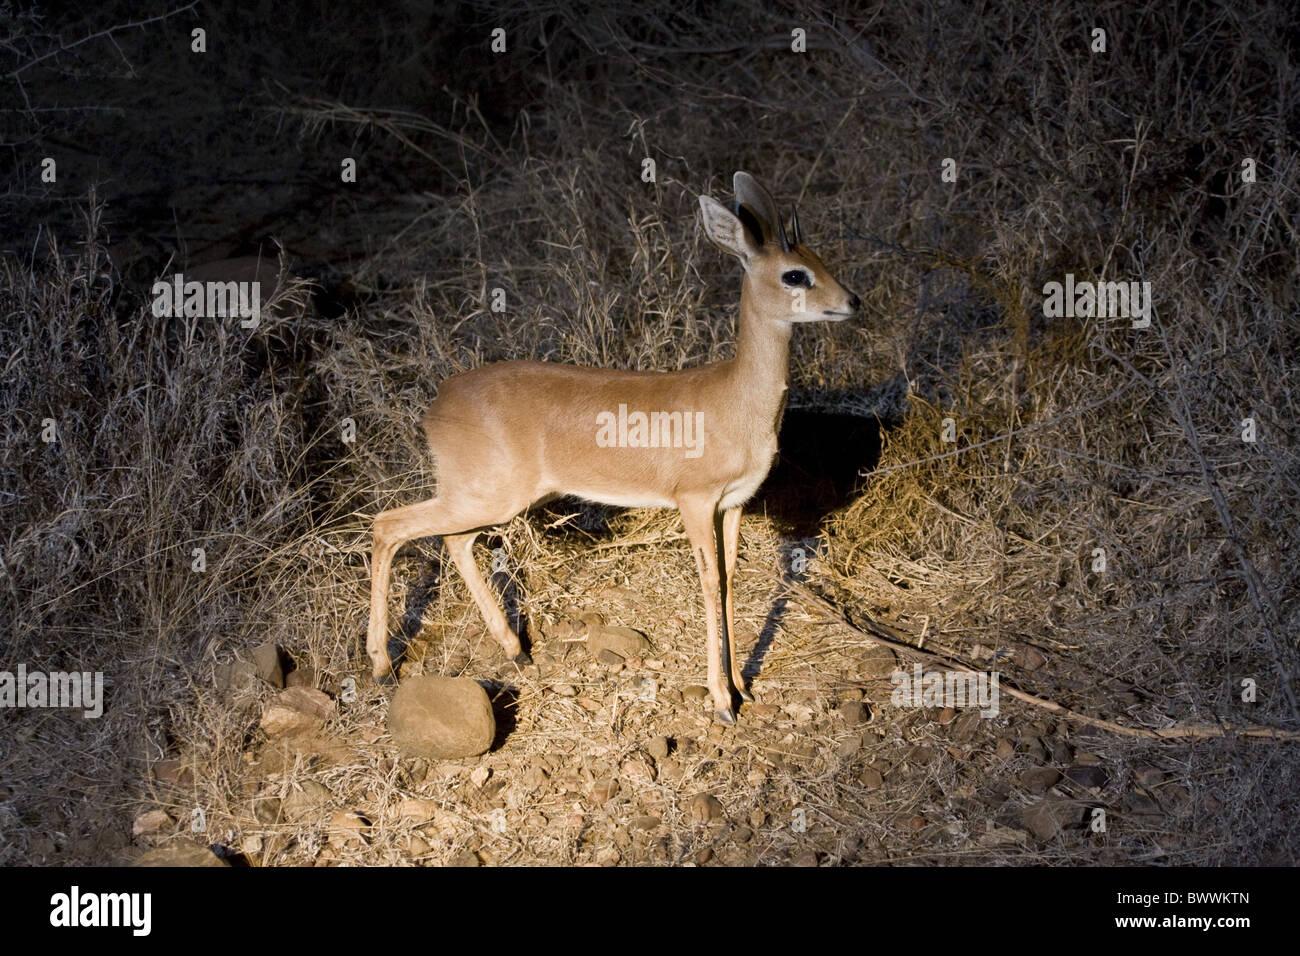 Male Steinbok photographed night using spot light - Stock Image